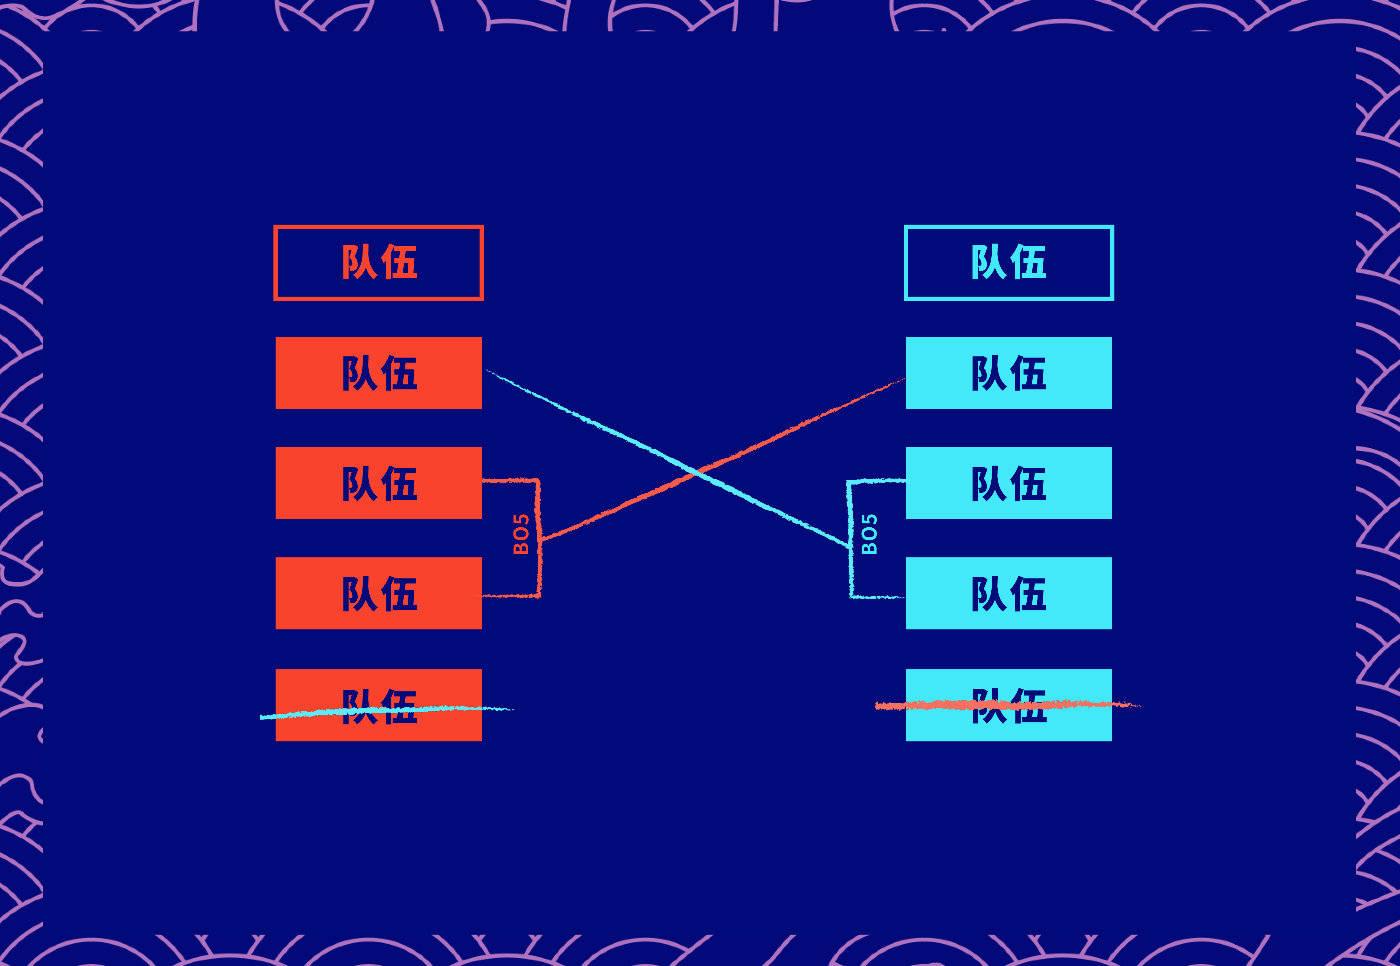 S10赛制变动:队伍缩减为22支 LCK3号种子直升小组赛